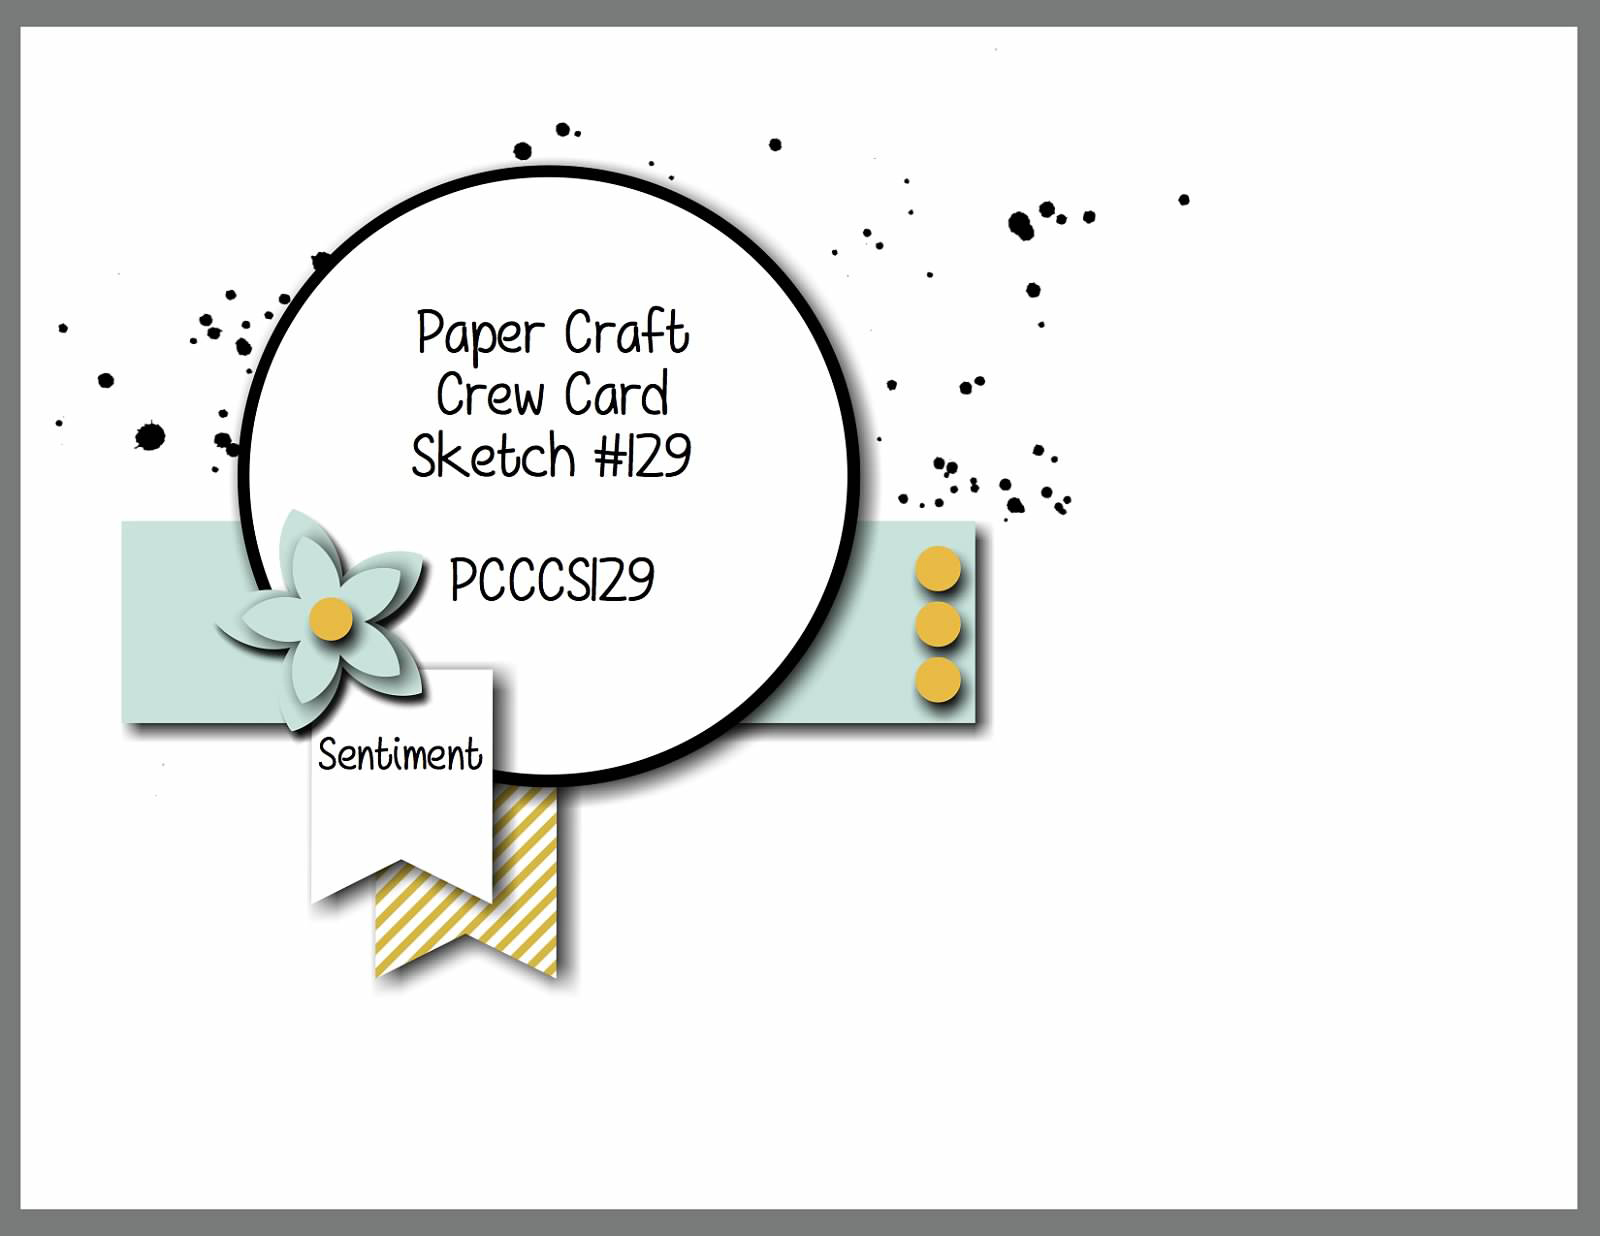 paper craft crew card sketch